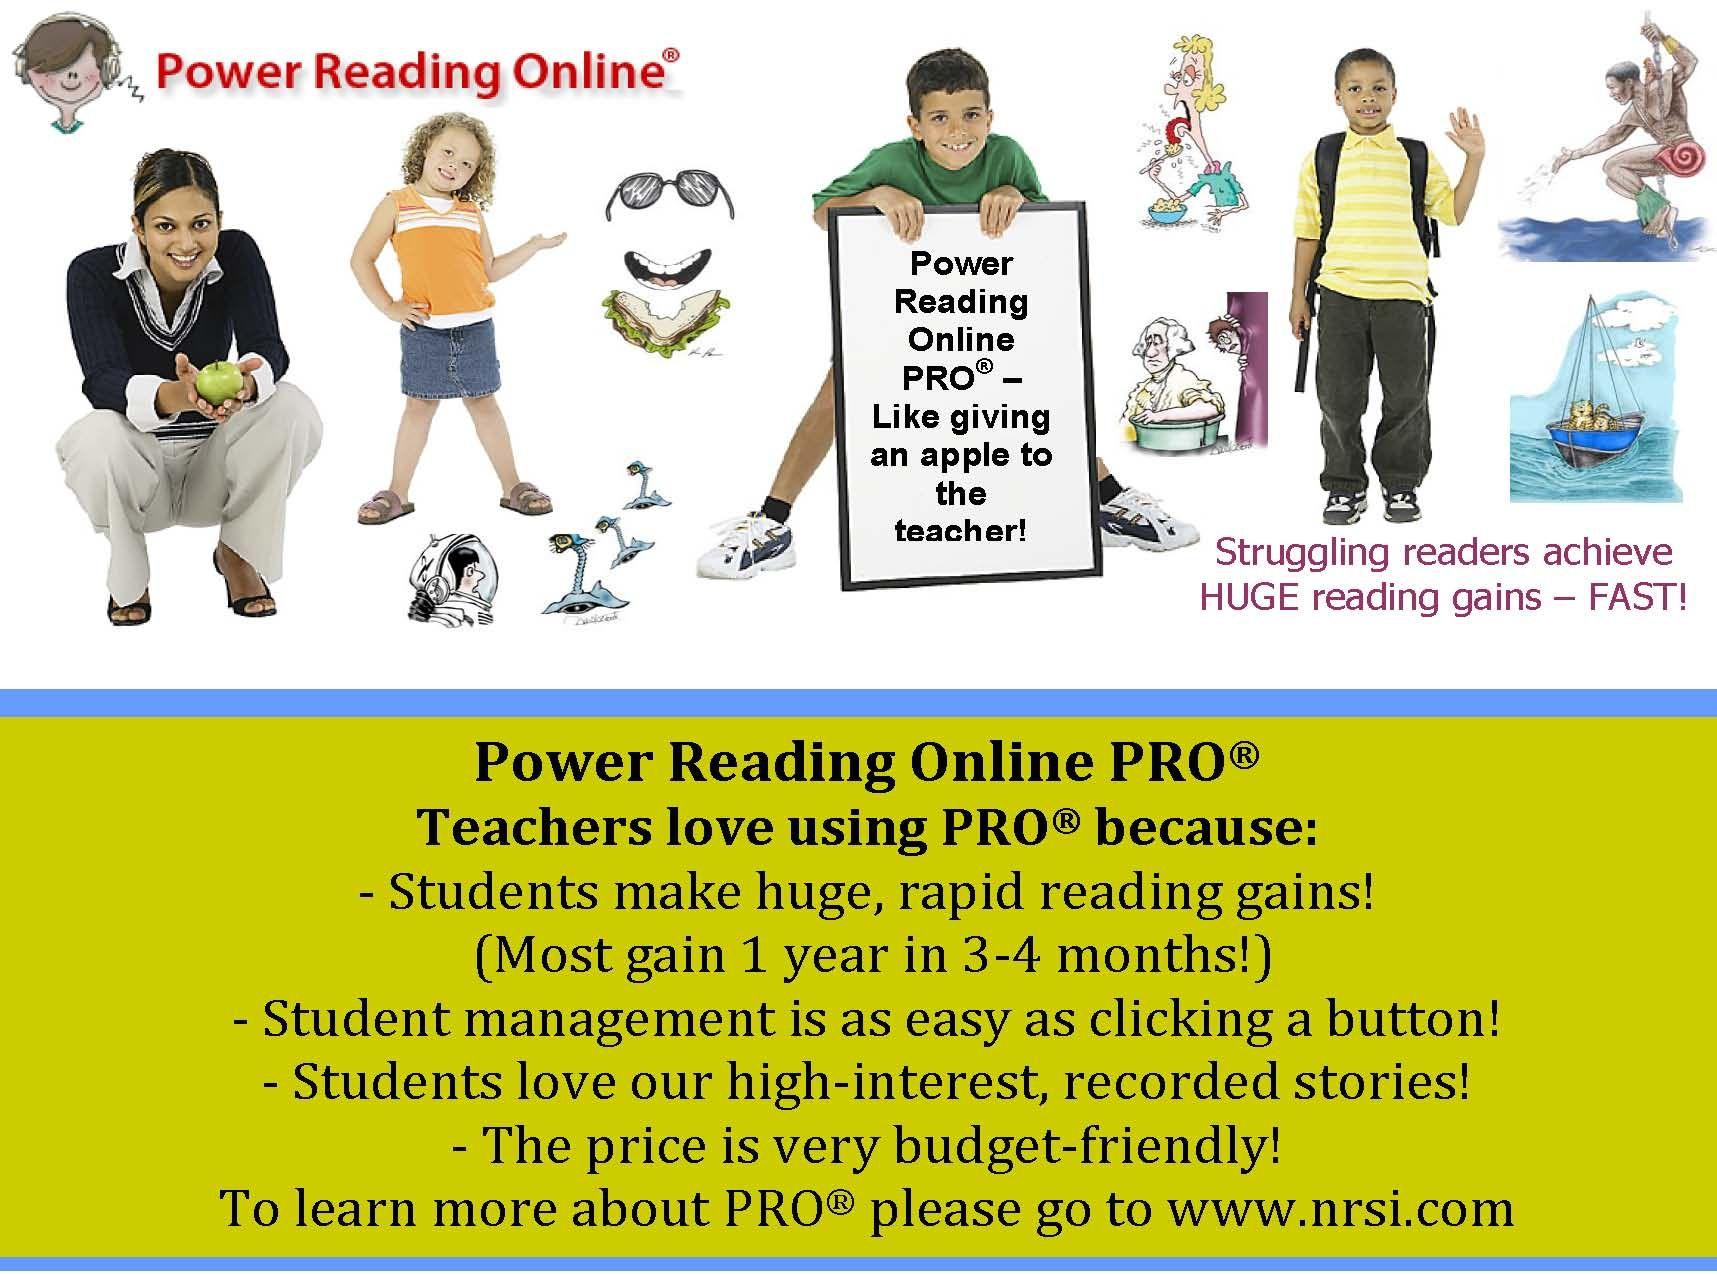 Power Reading Online PRO - K-12 The best online reading ...